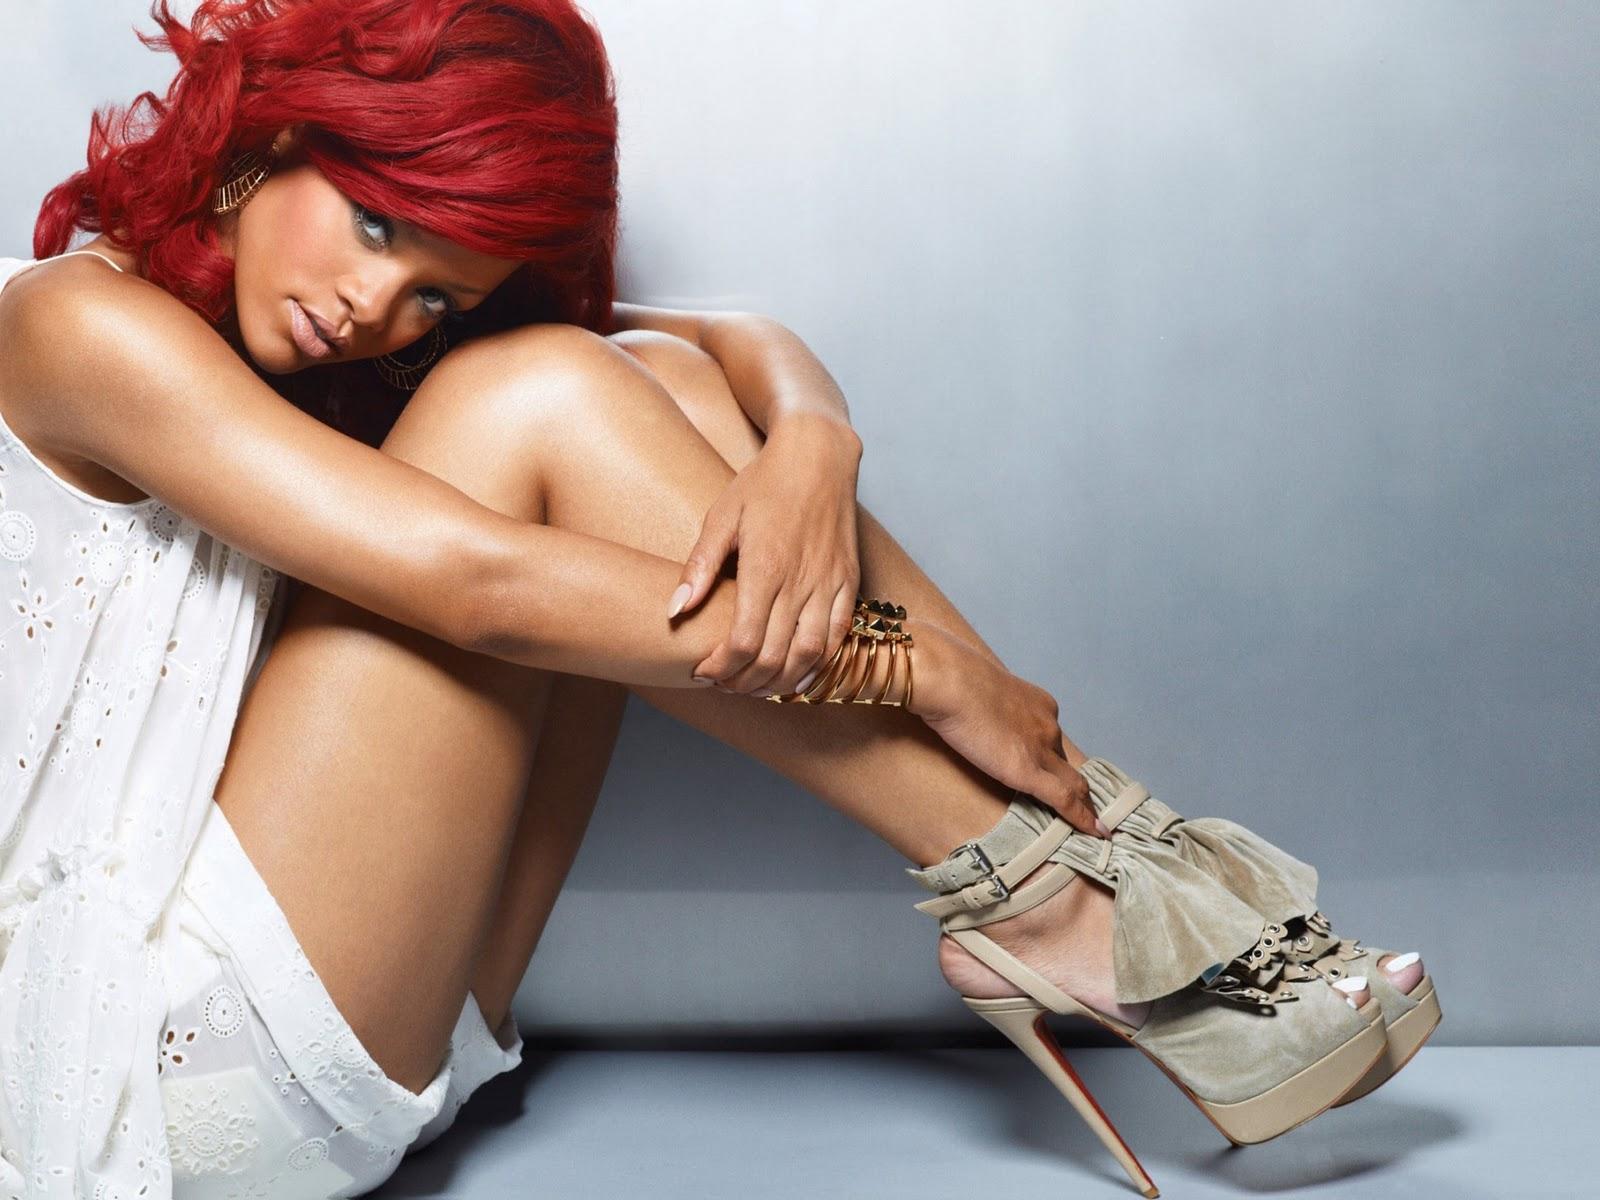 http://2.bp.blogspot.com/-hlY-SOnTX7A/TVi5TKOlWzI/AAAAAAAABTI/86p7lPwEo1E/s1600/Rihanna.jpg